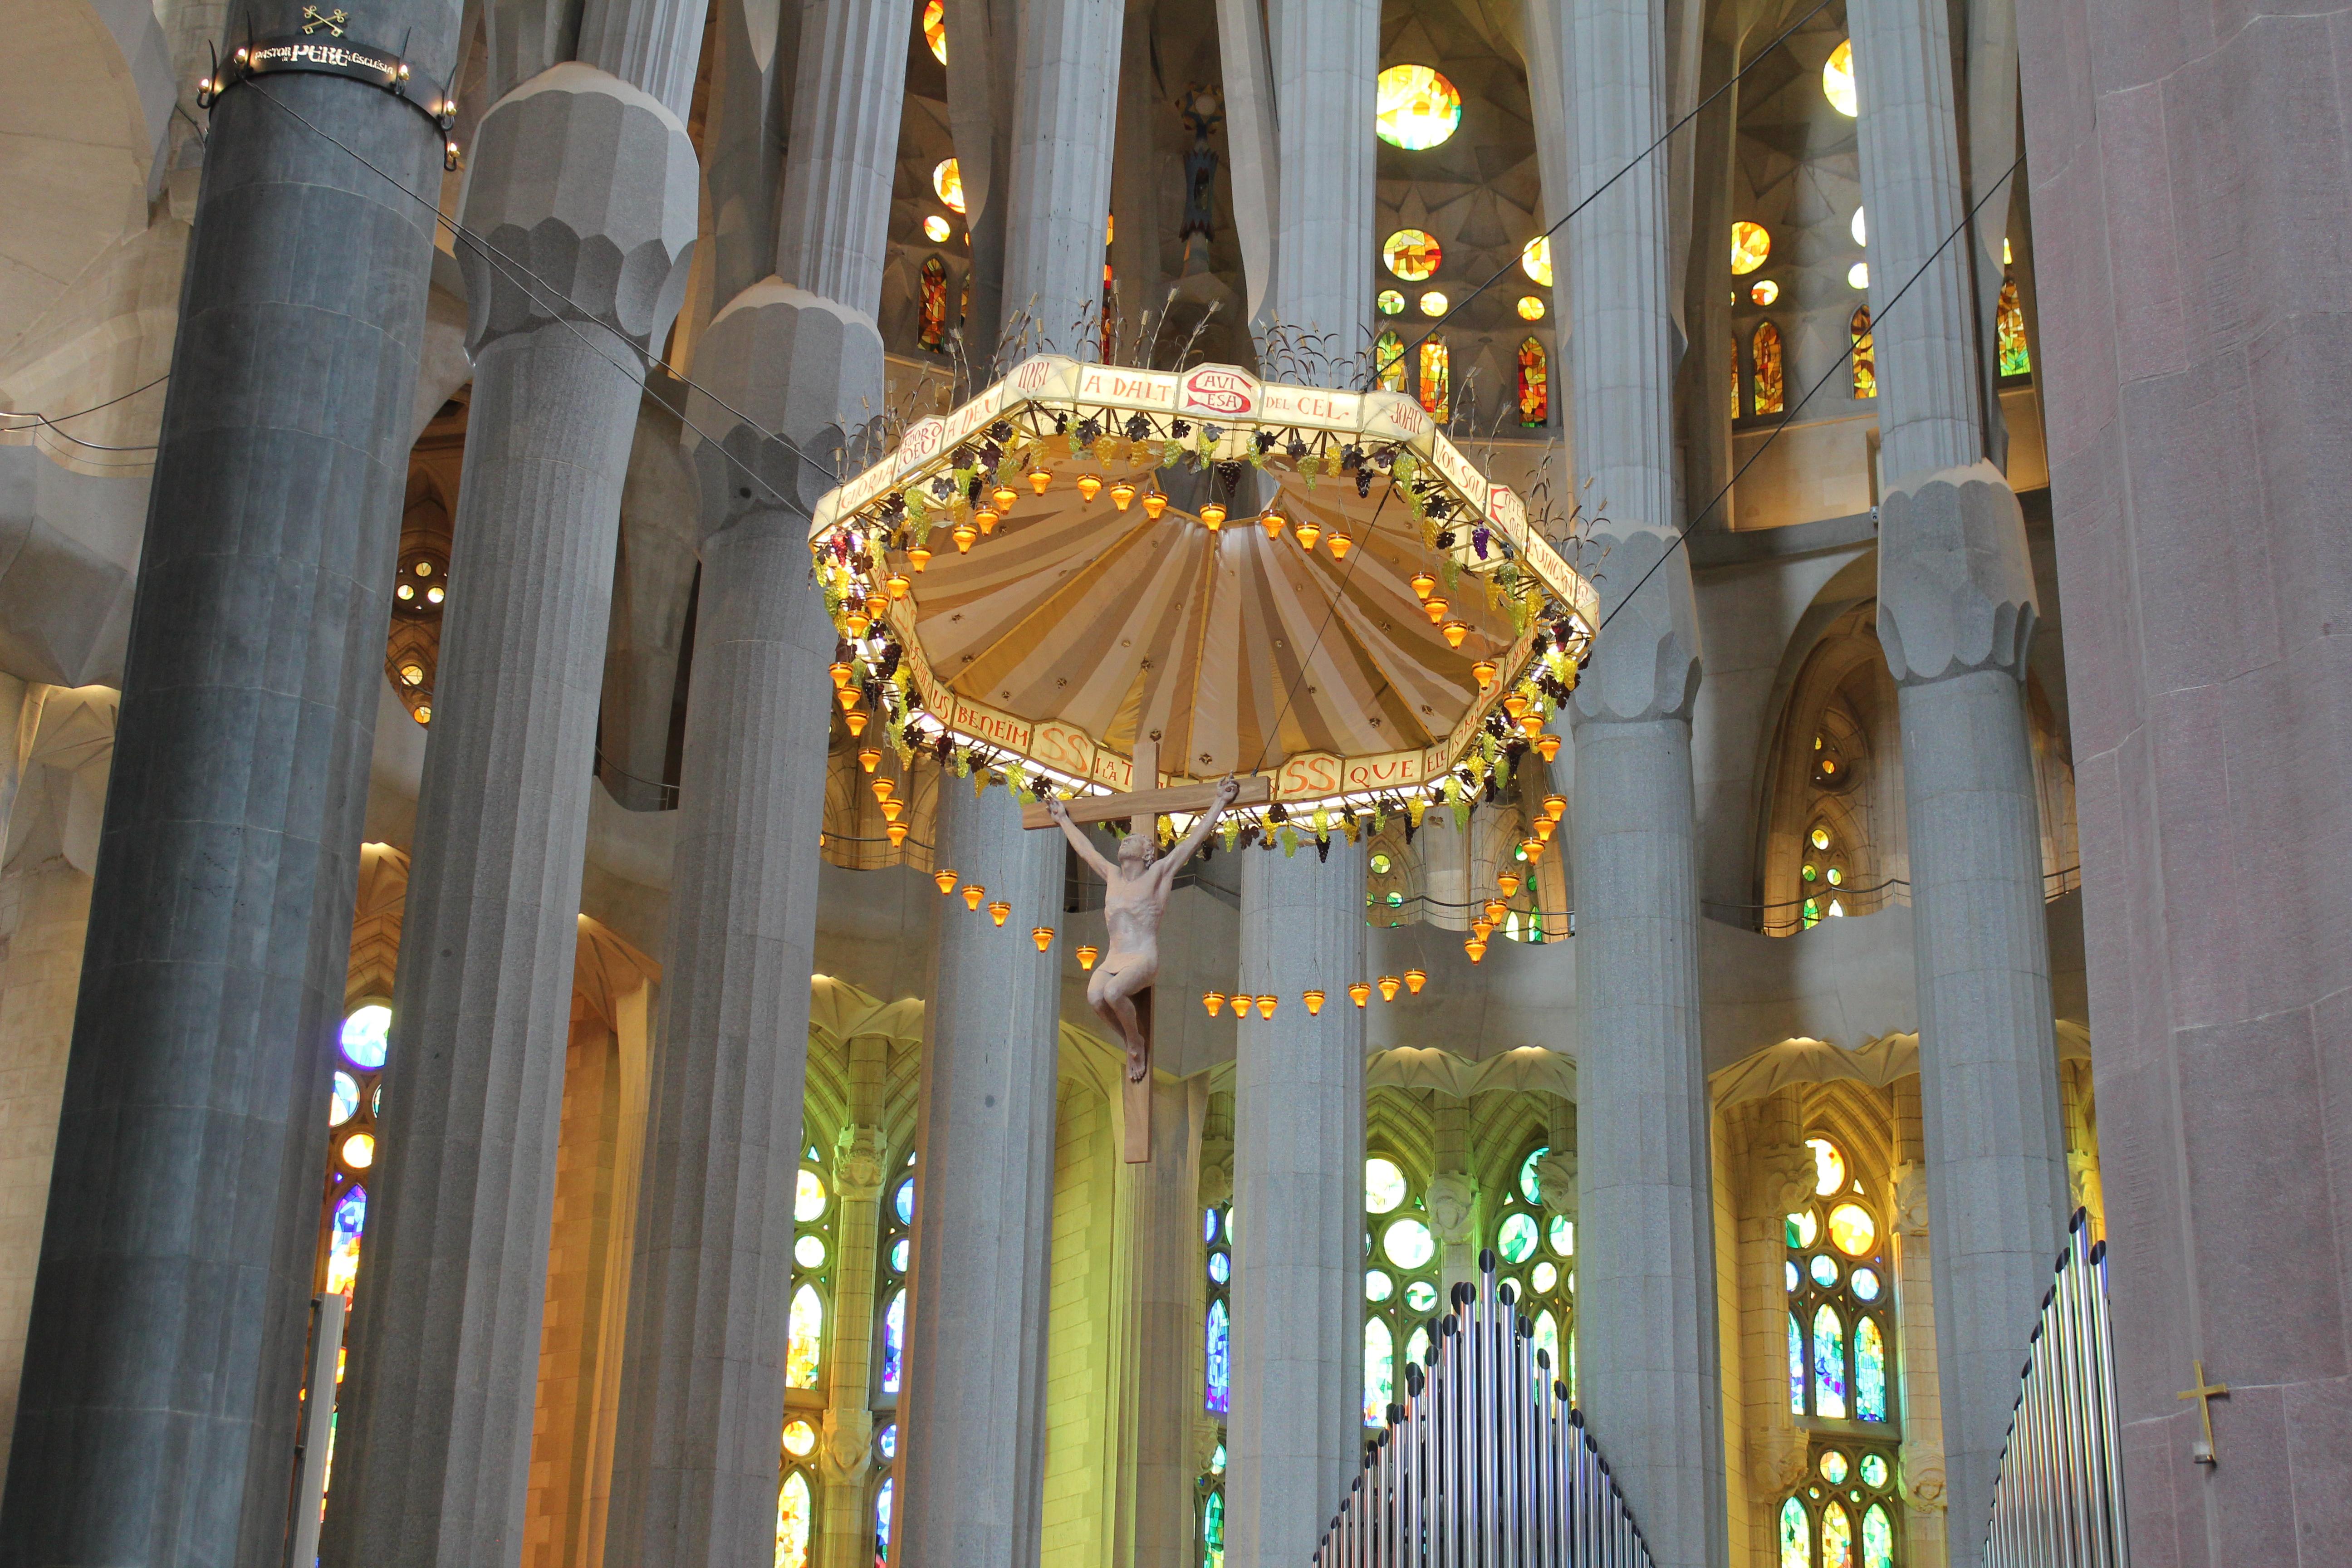 Altar at gaudi familia sagrada church in barcelona spain for Gaudi kathedrale barcelona